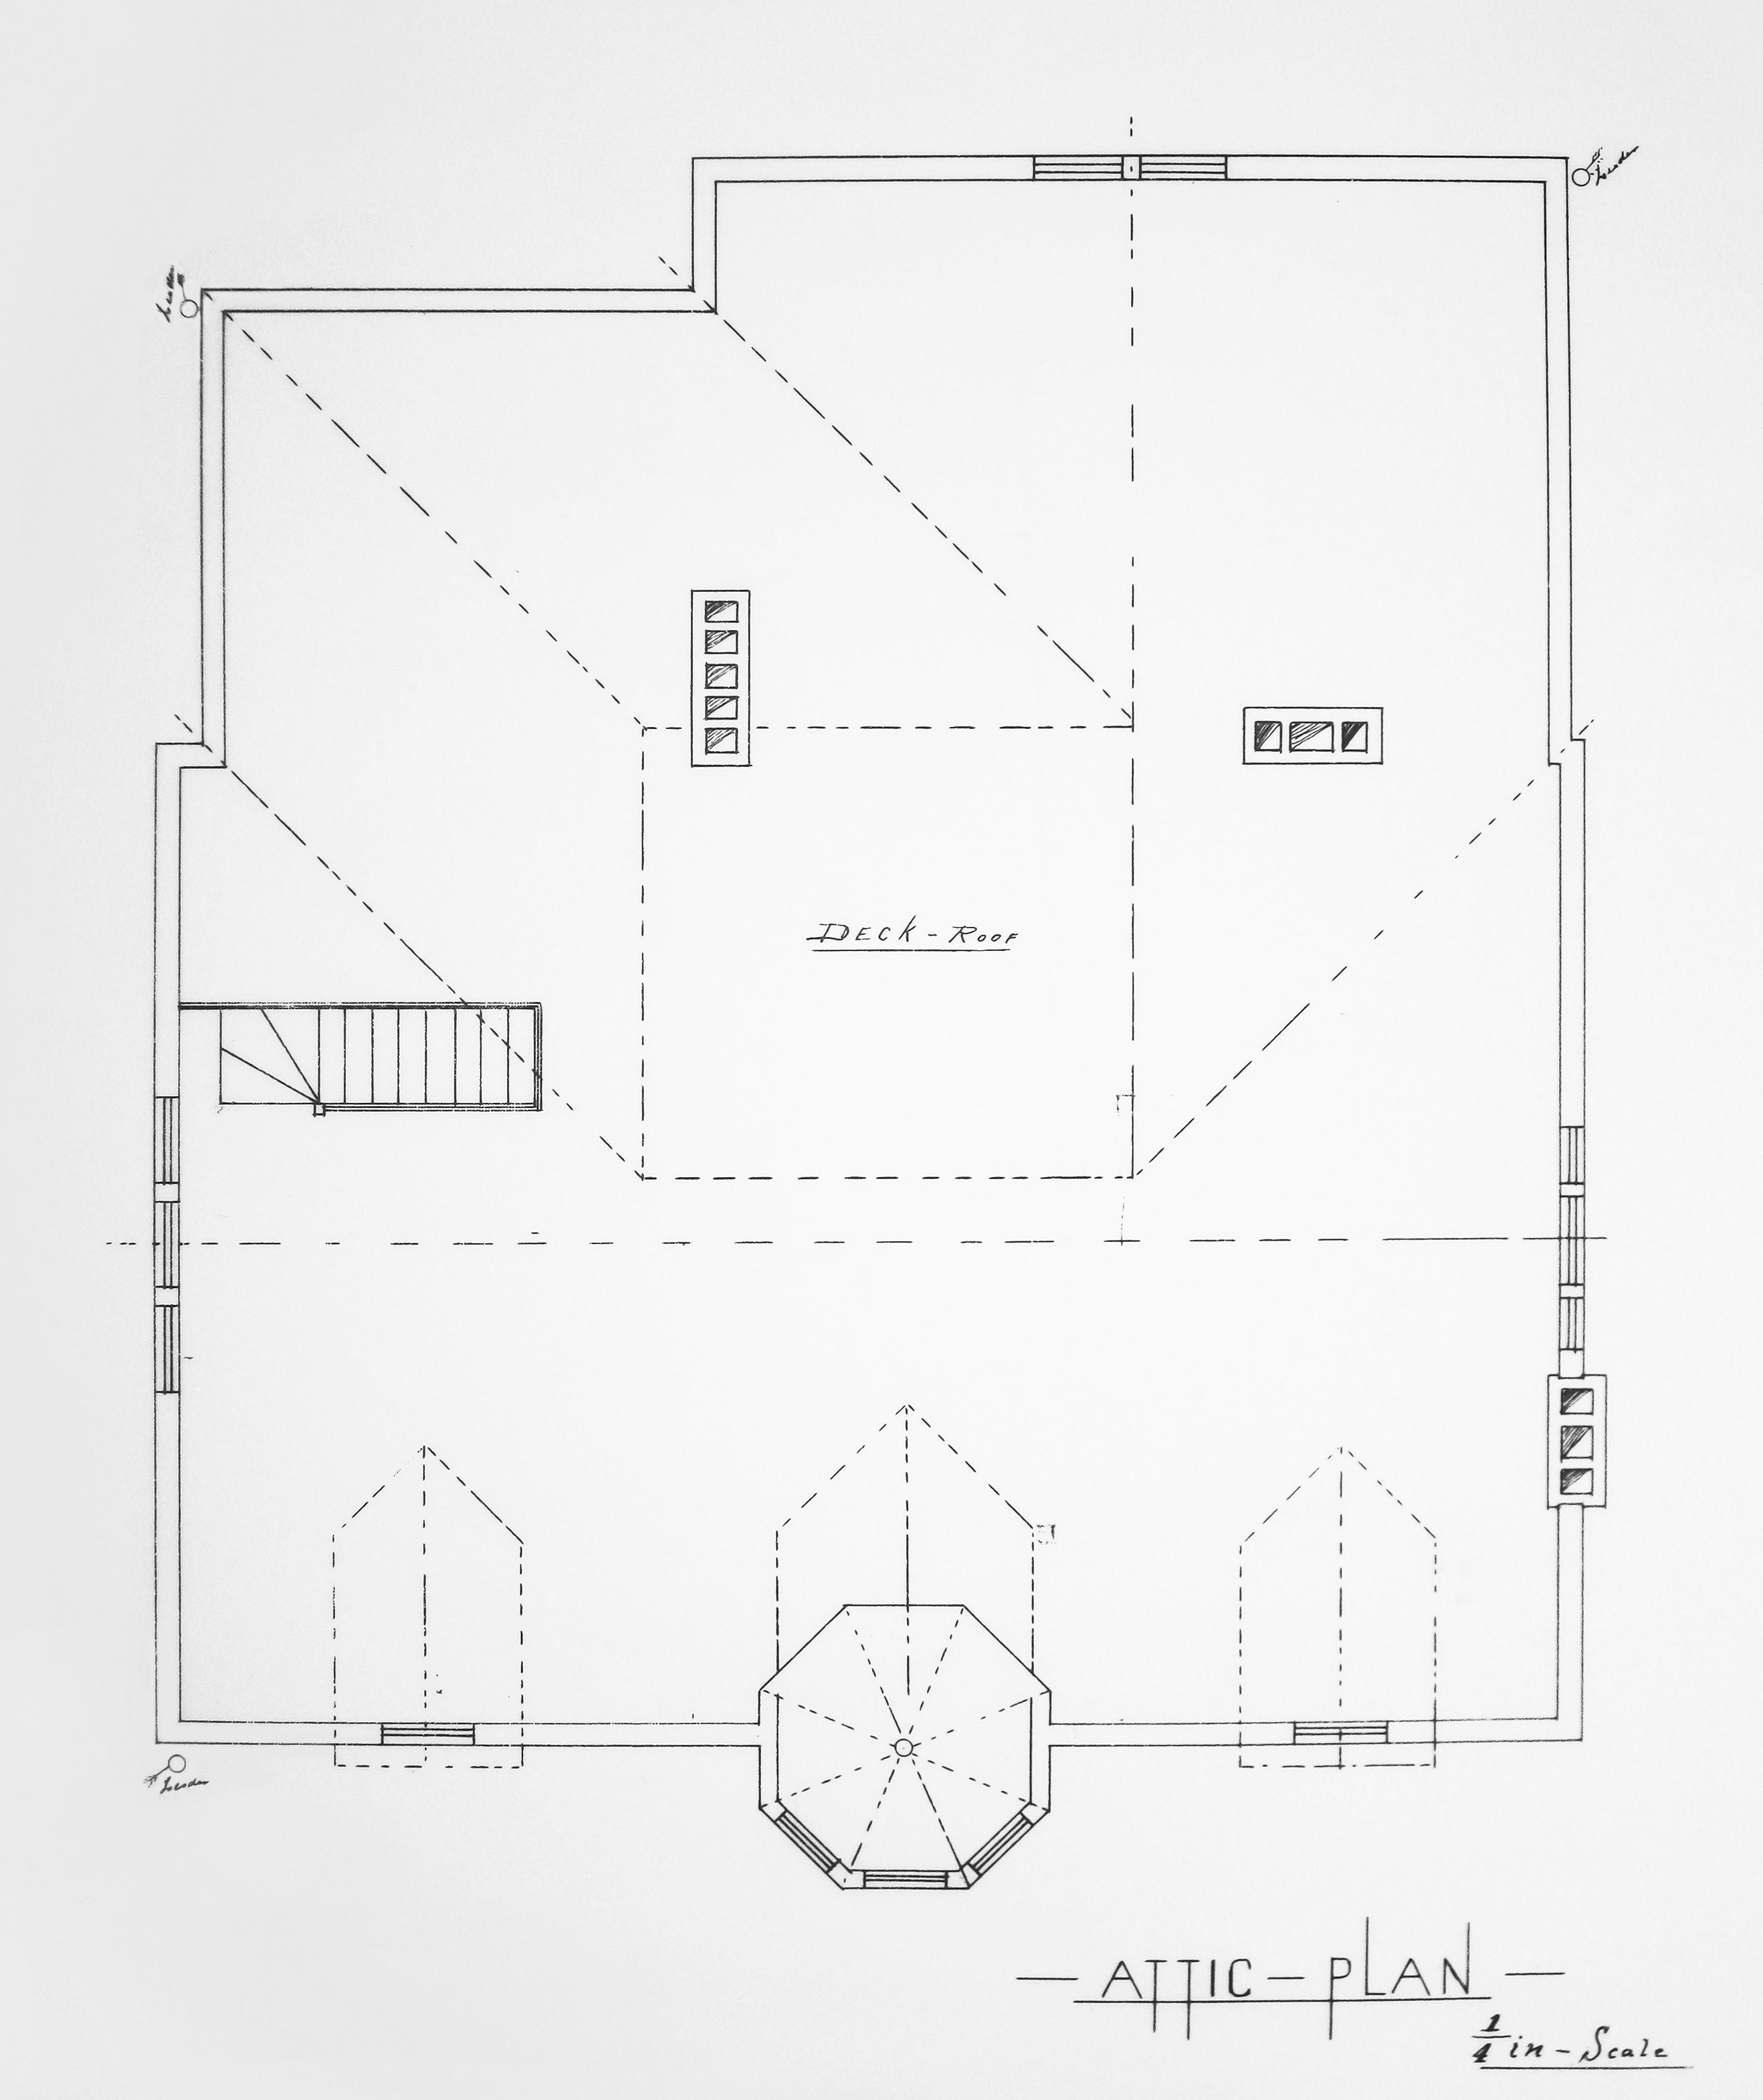 Blueprint of the Hudson House Attic